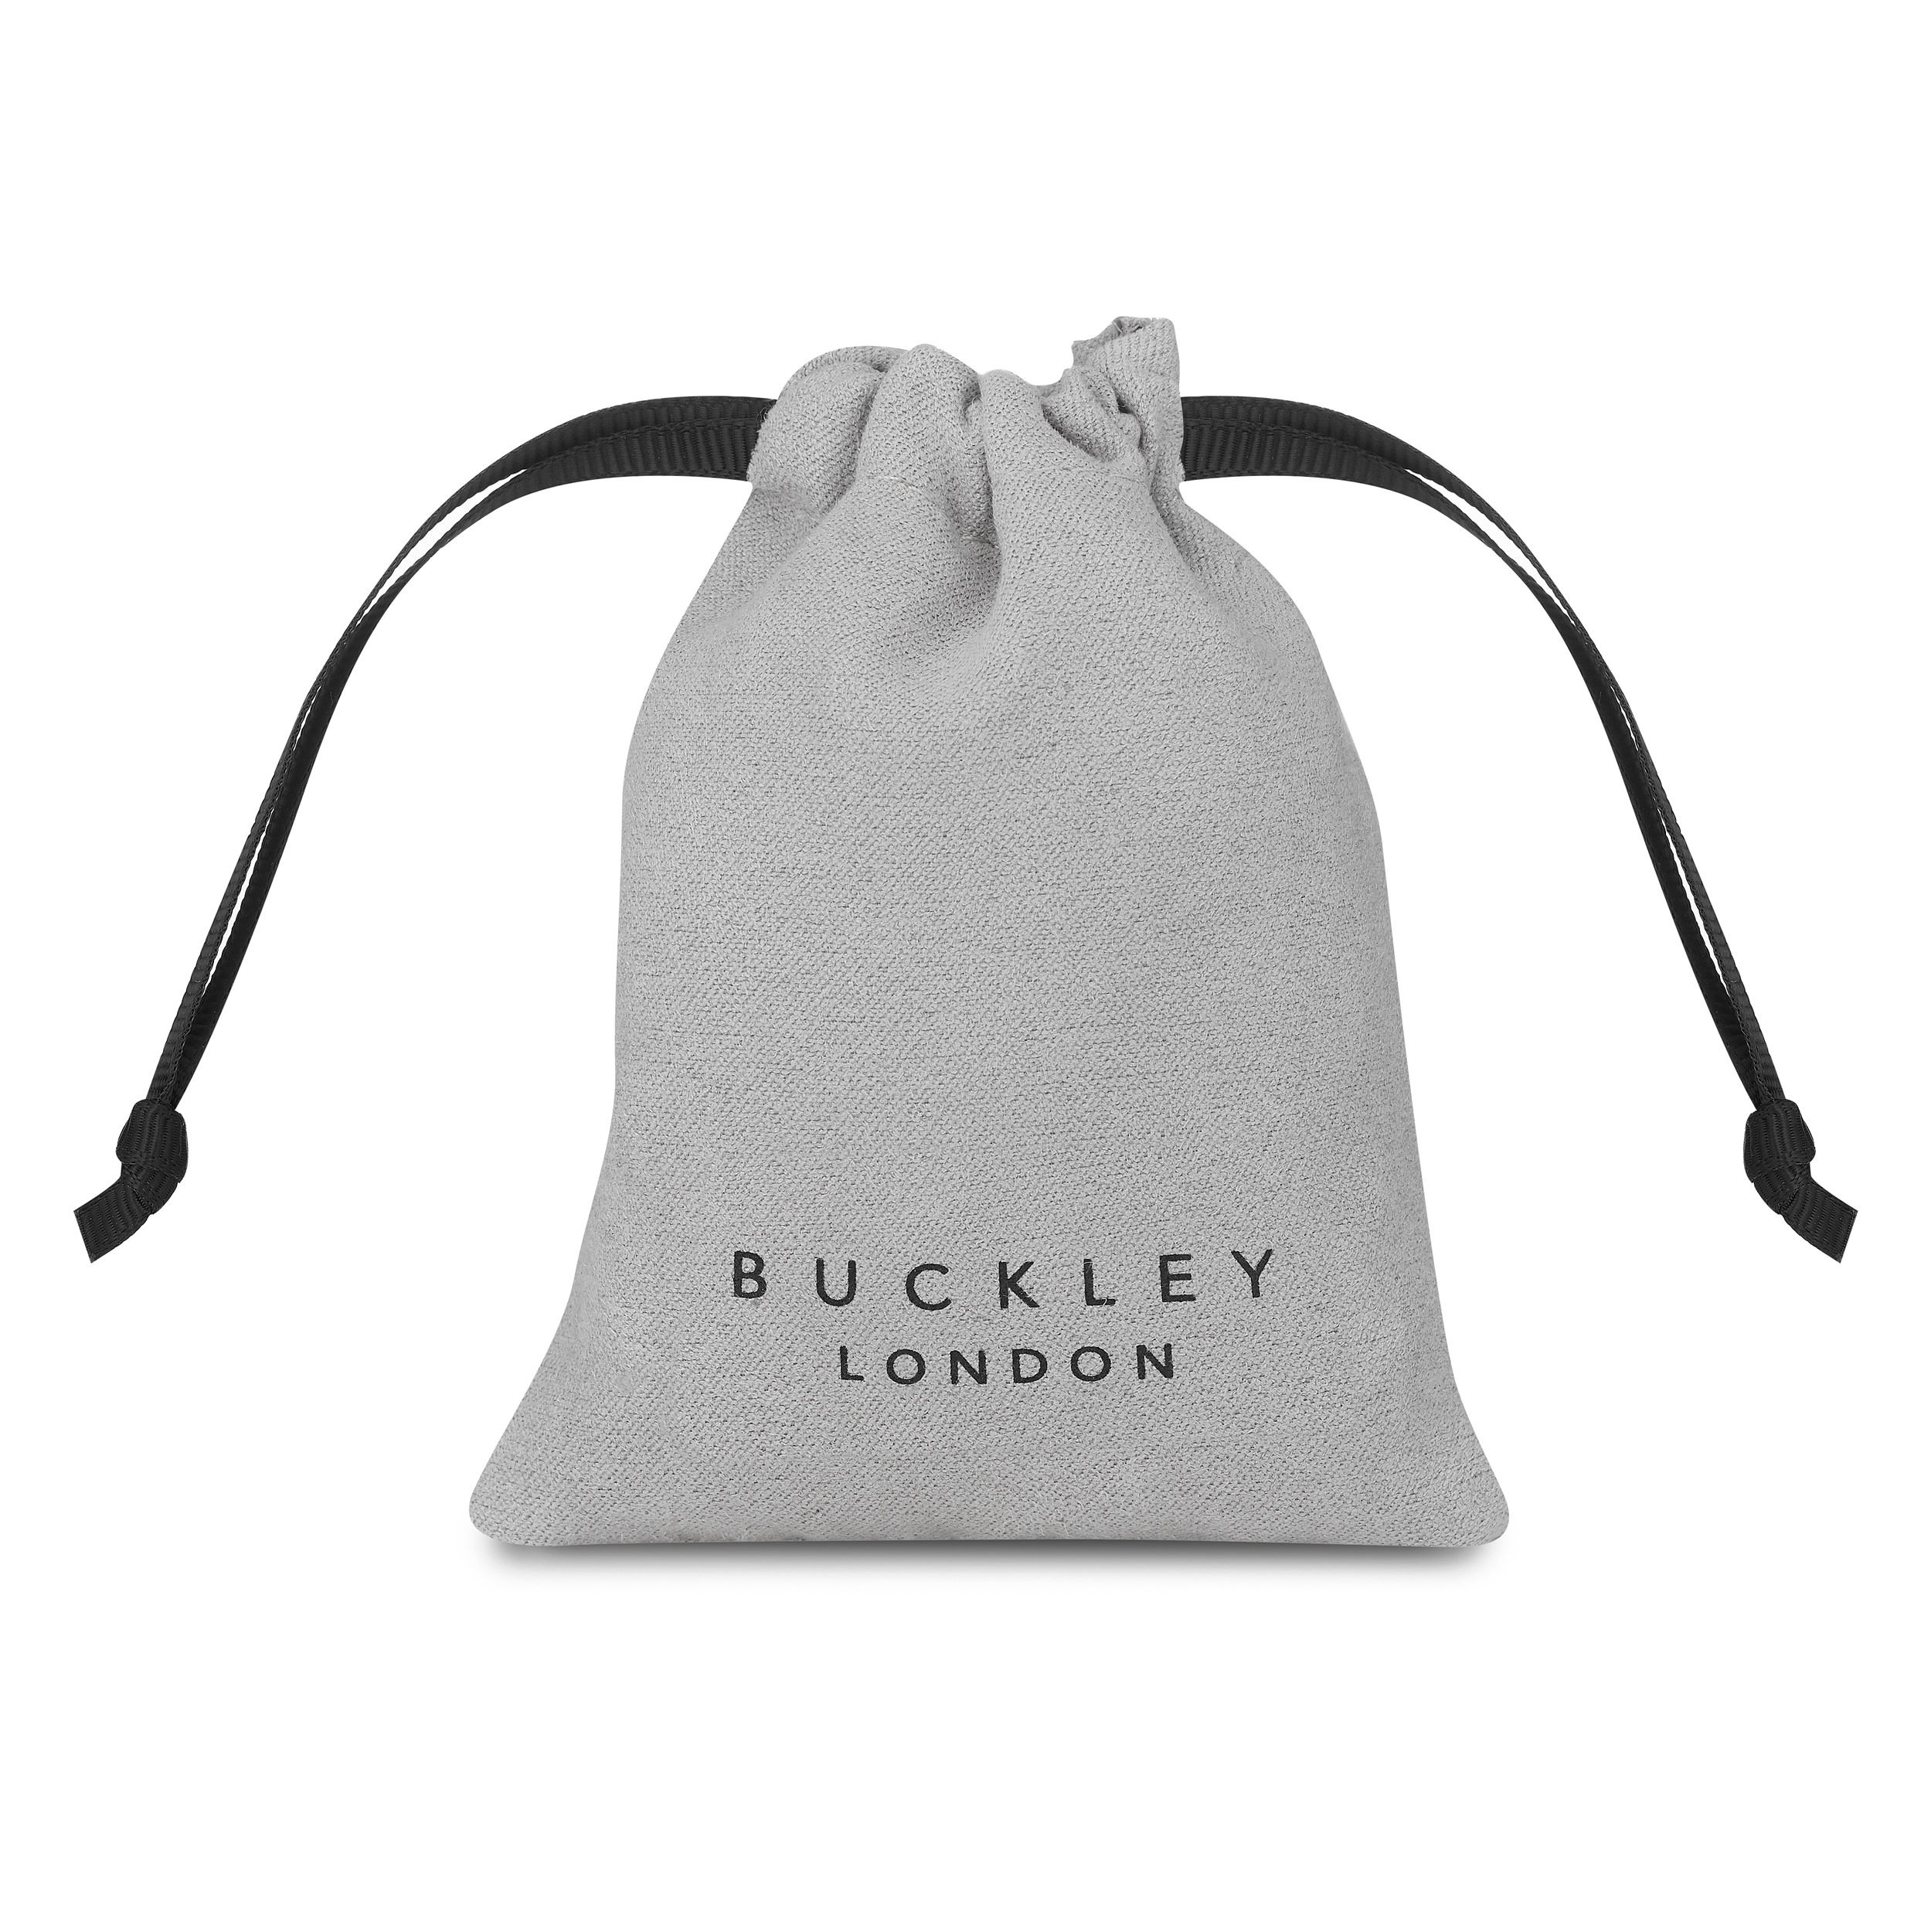 Buckley London Piccadilly Prima Bracelet - Gold Bag